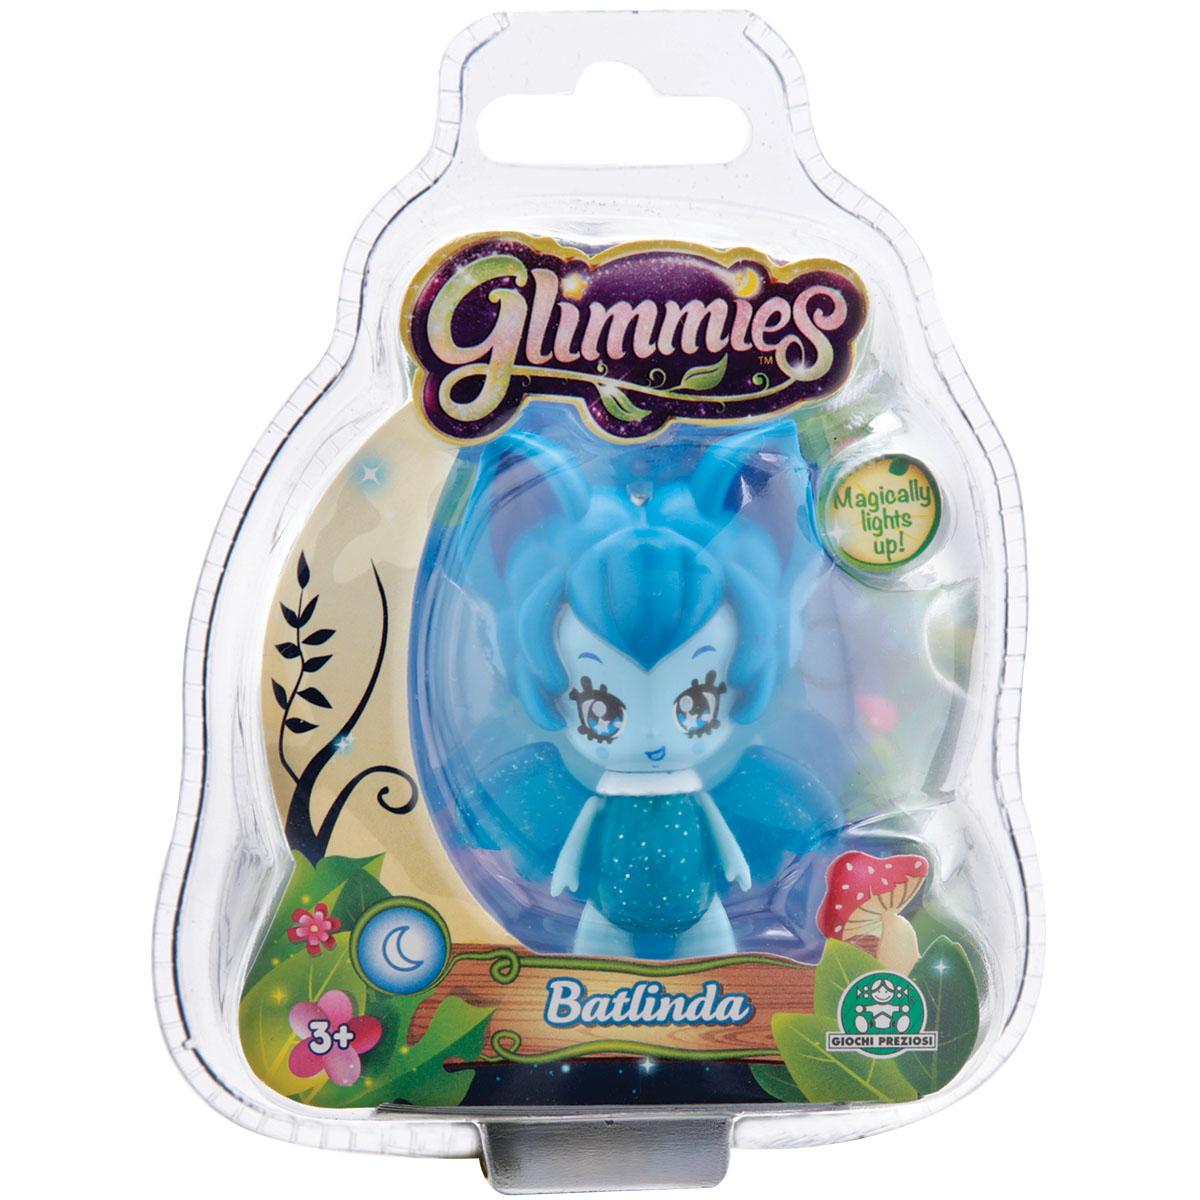 Glimmies Кукла Batlinda каталог найк в красноярске каталог товаров